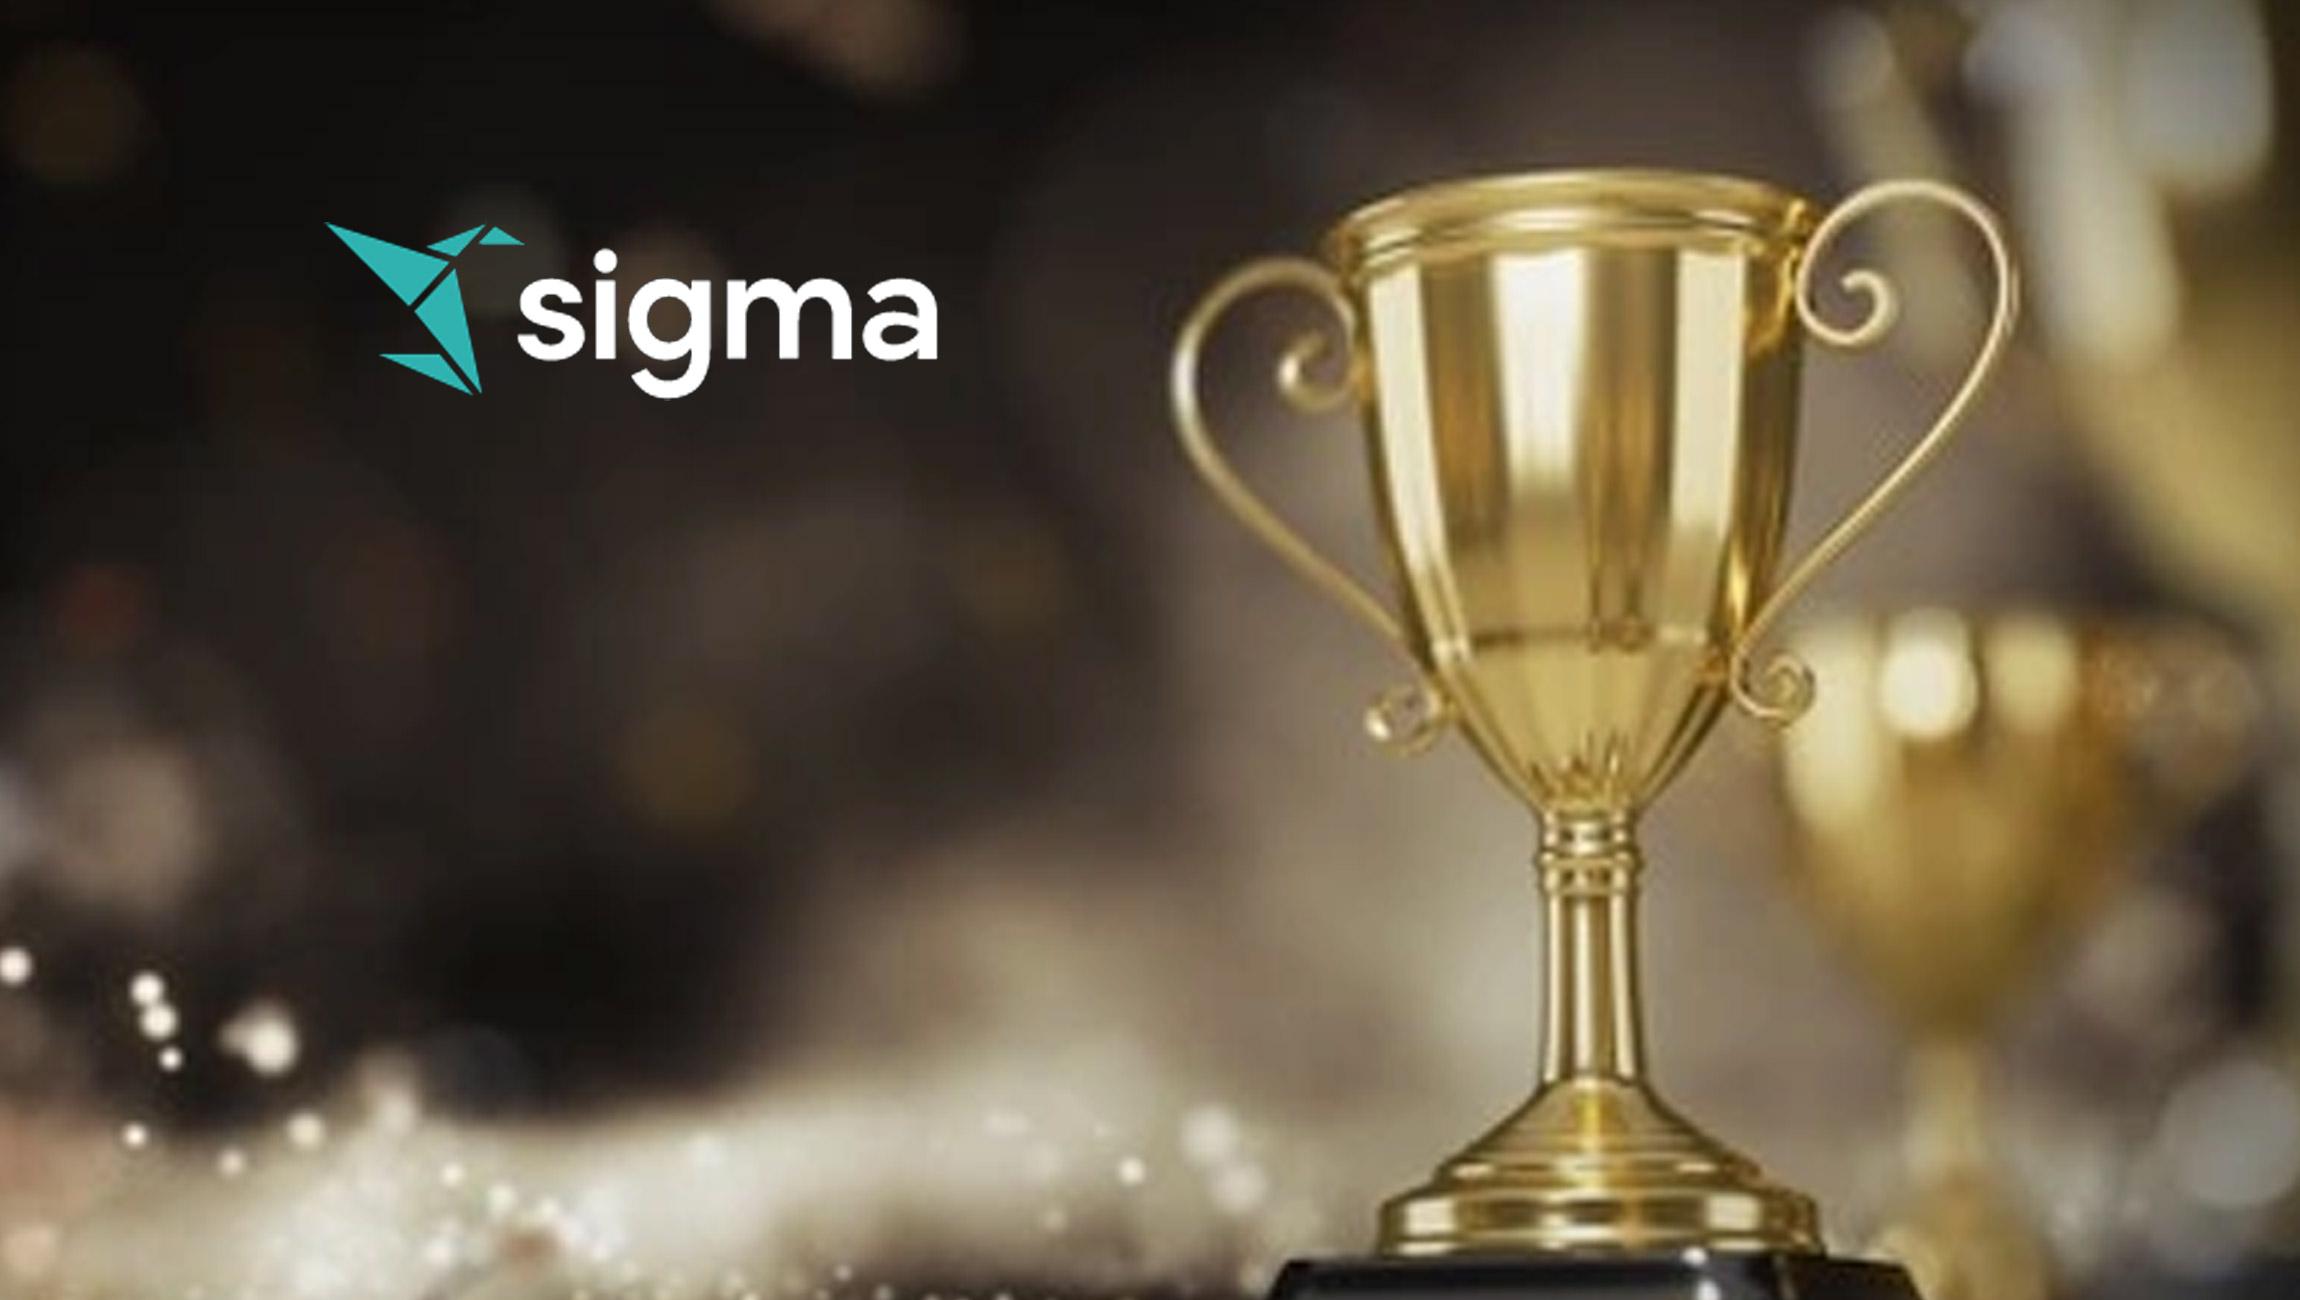 Sigma-Computing-Earns-a-2021-Top-Rated-Award-From-TrustRadius